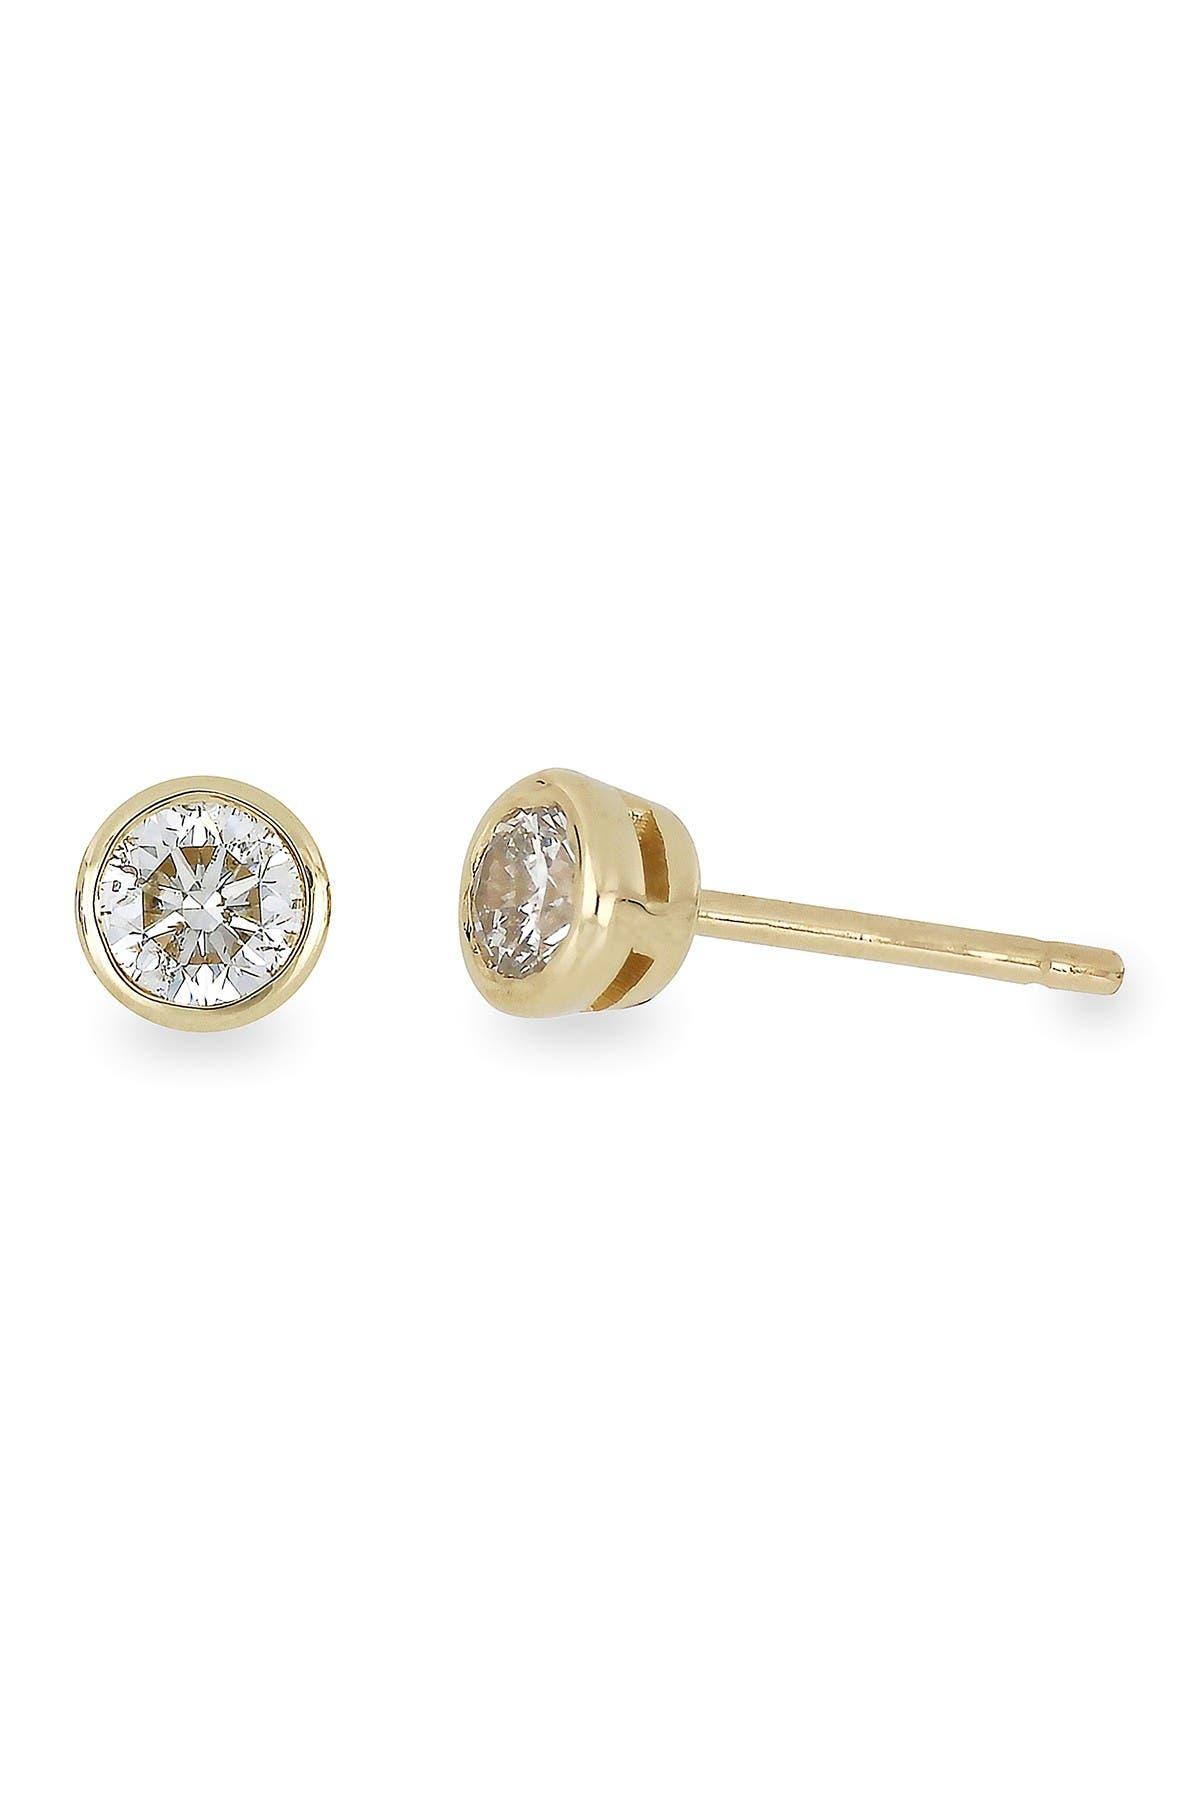 Image of Bony Levy 14K Gold Round-Cut Diamond Stud Earrings - 0.75 ctw